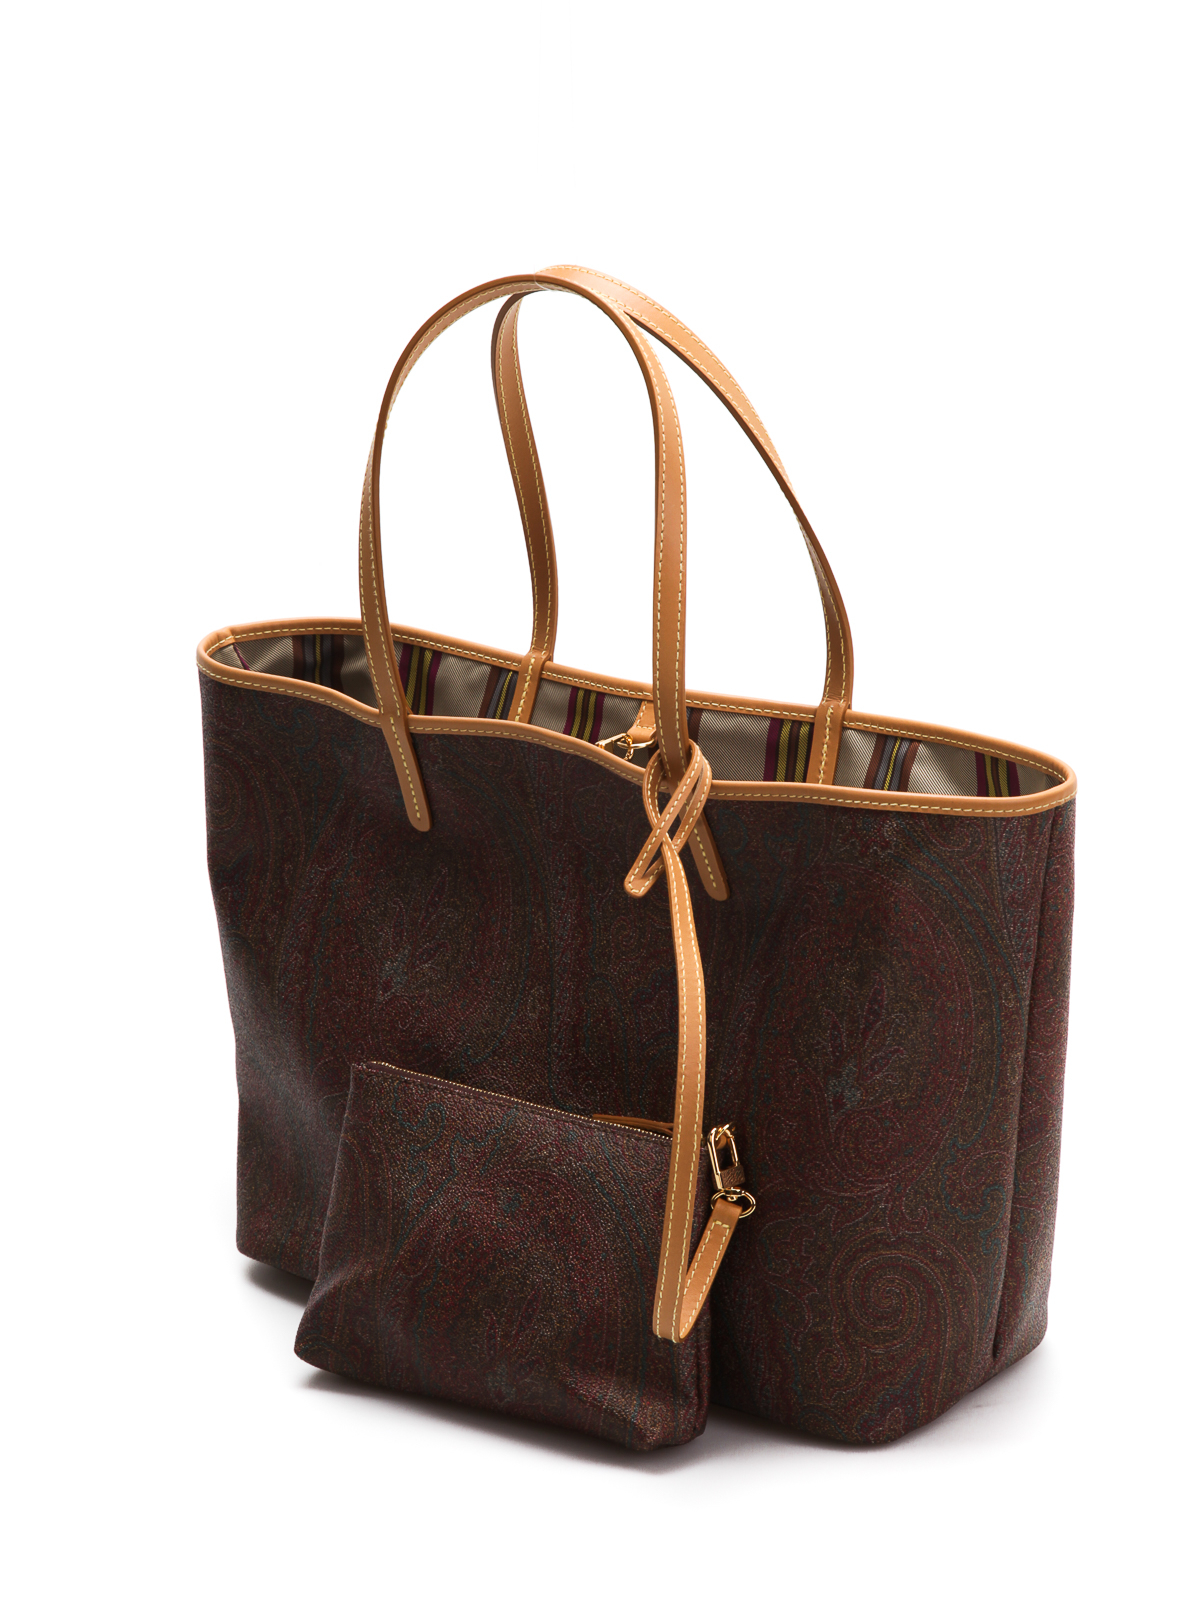 buy online da93a 43f92 Etro - Paisley shopper bag - totes bags - 0B374 1606 600 ...